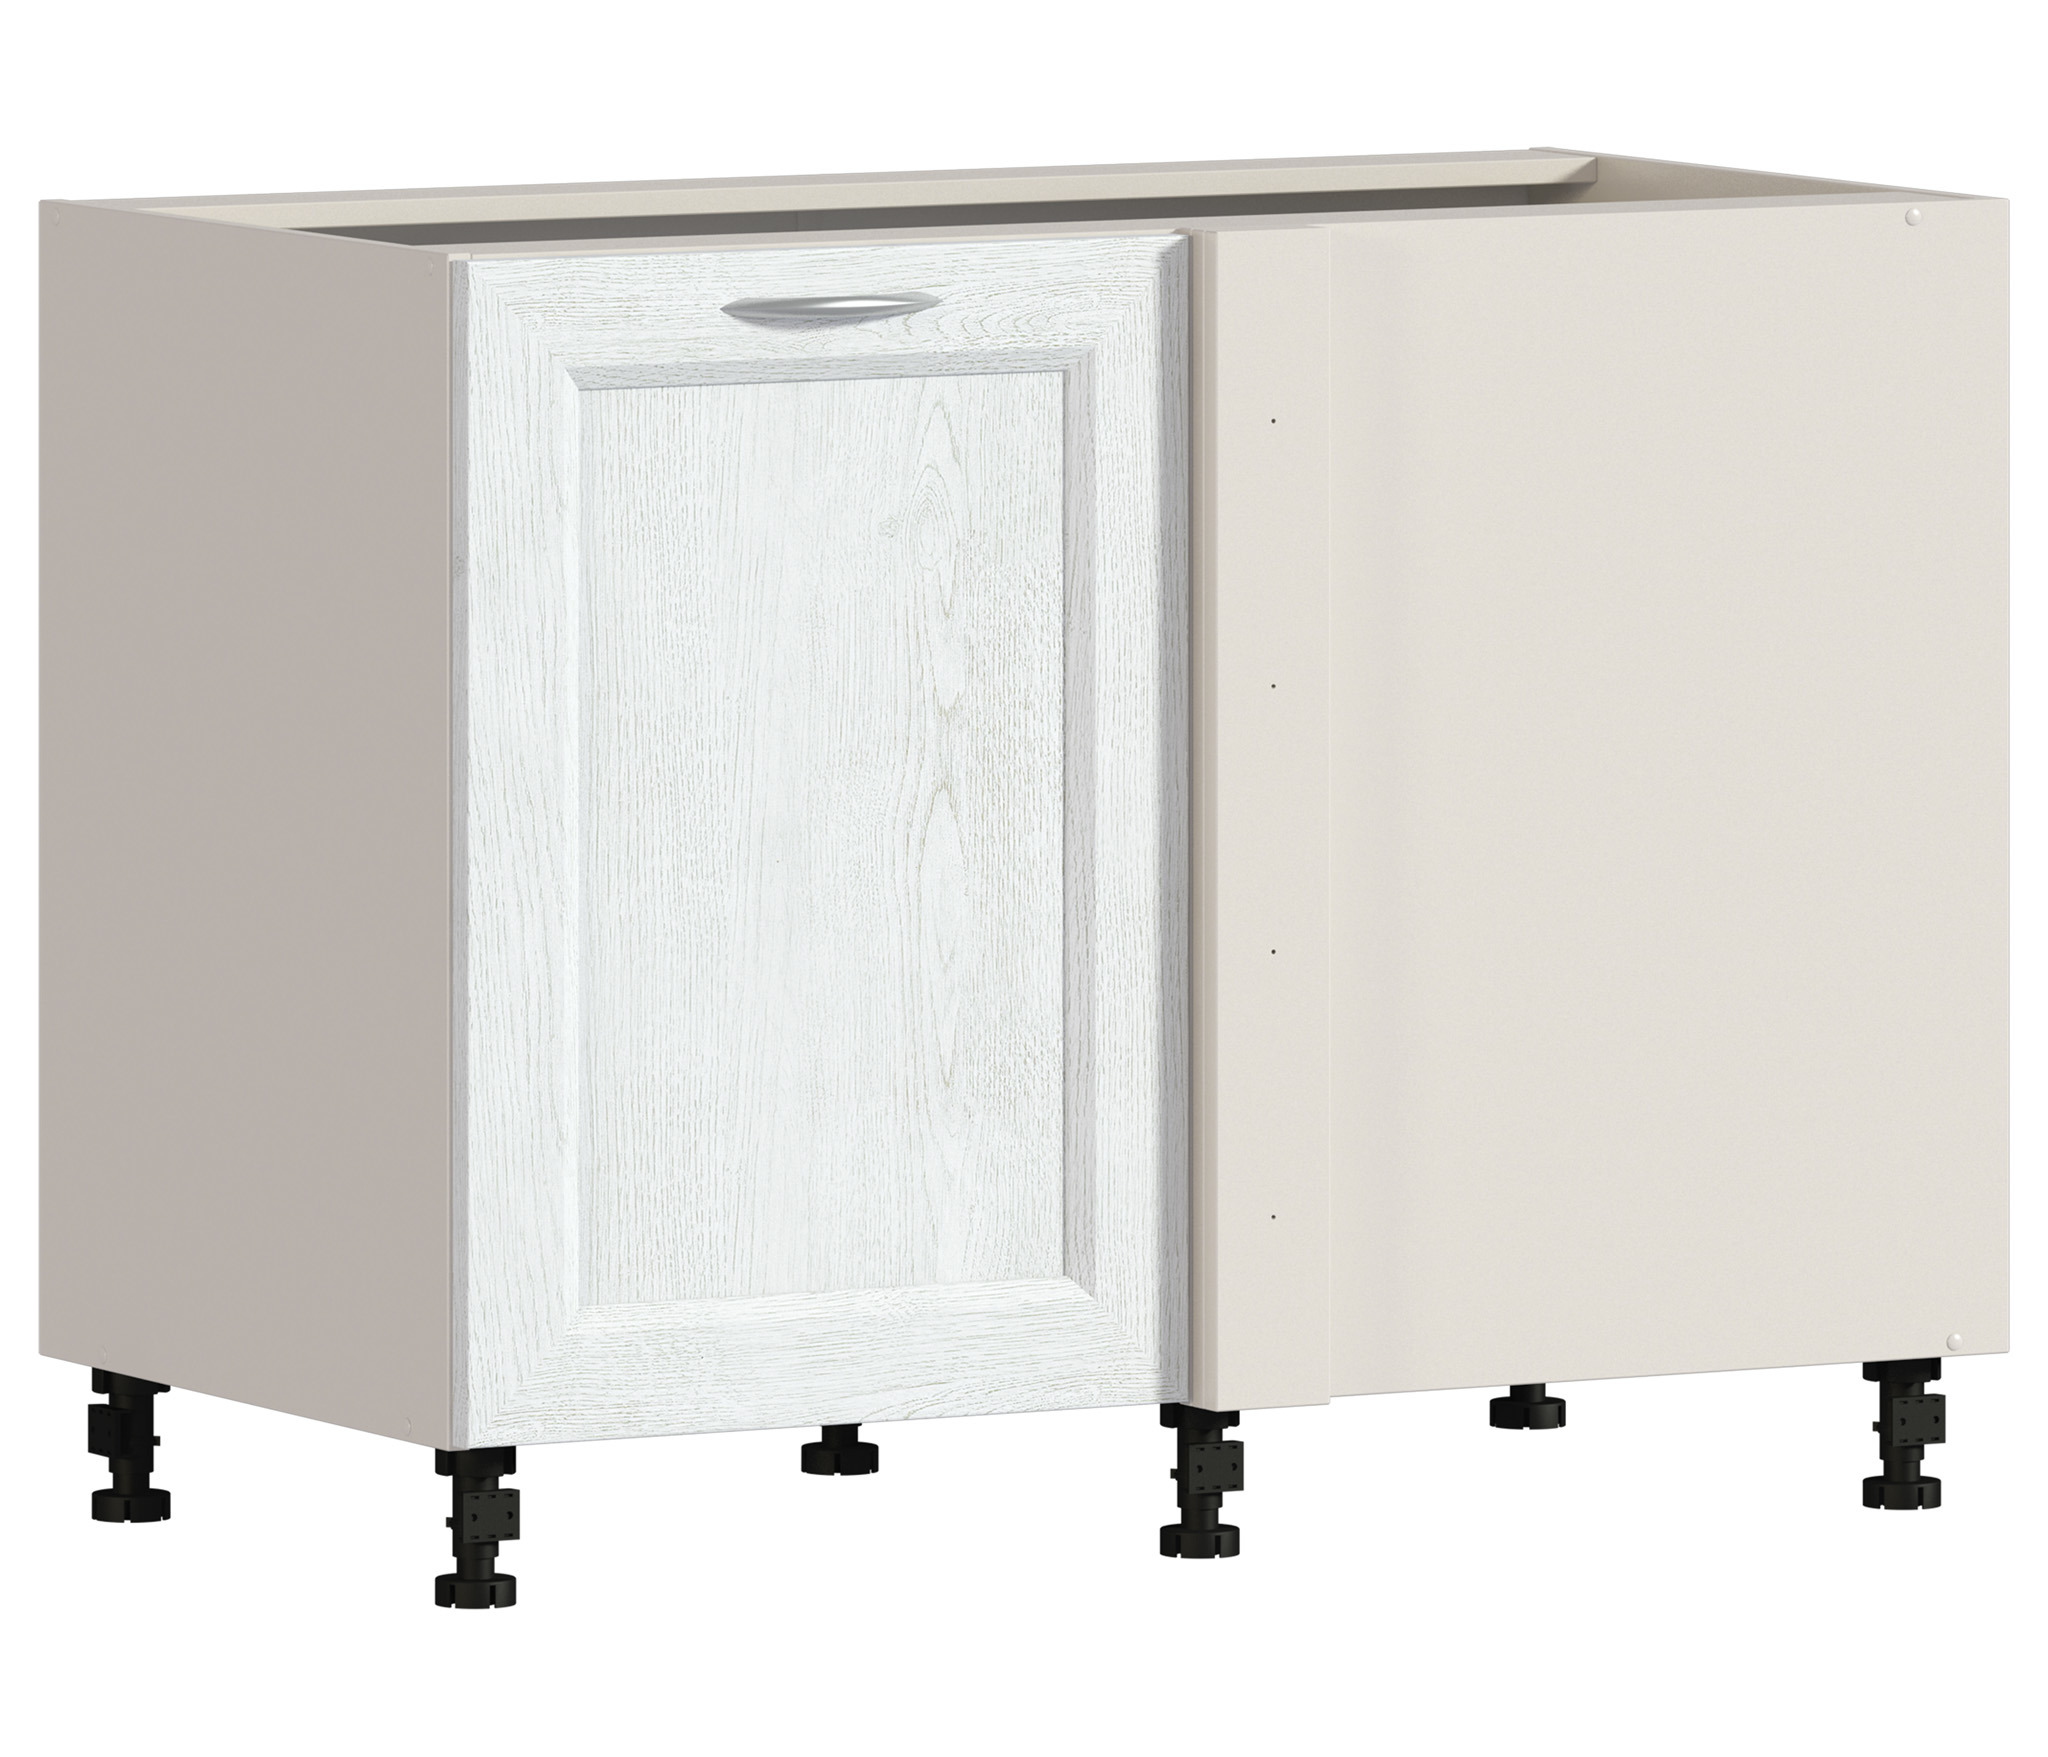 Регина РСП-100 стол приставнойГарнитуры<br><br><br>Длина мм: 1087<br>Высота мм: 820<br>Глубина мм: 563